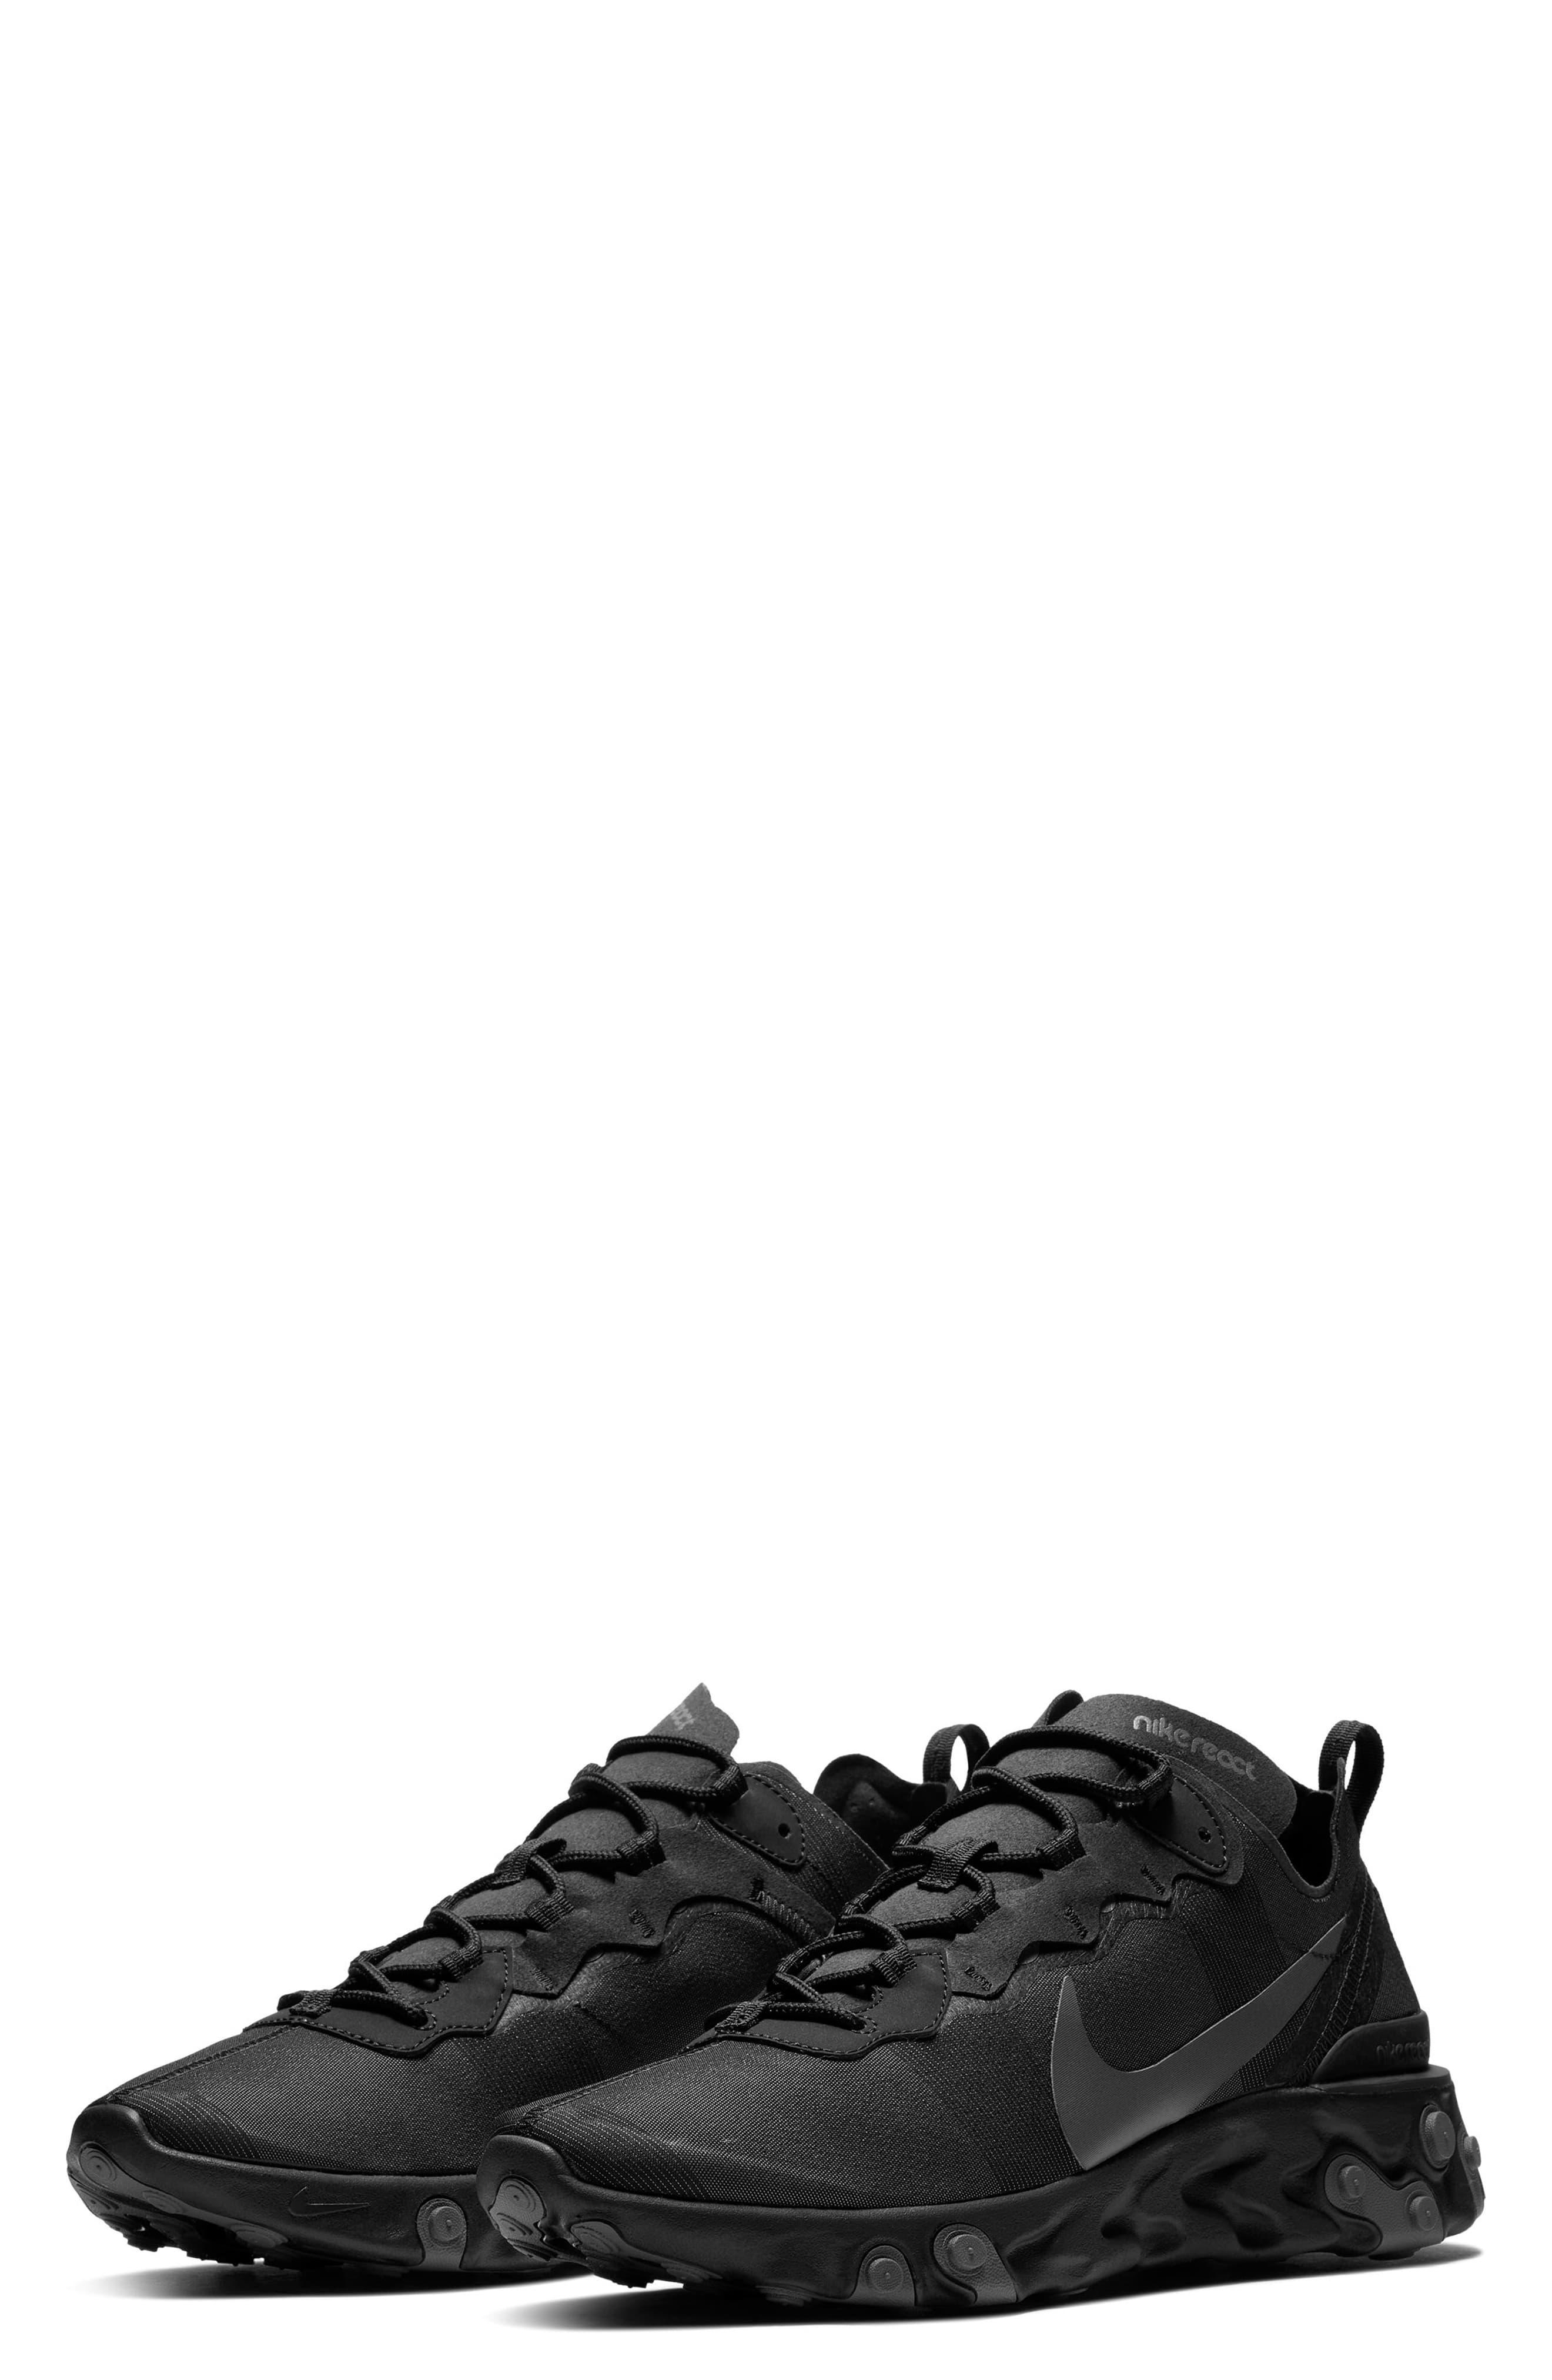 nordstrom mens nike shoes